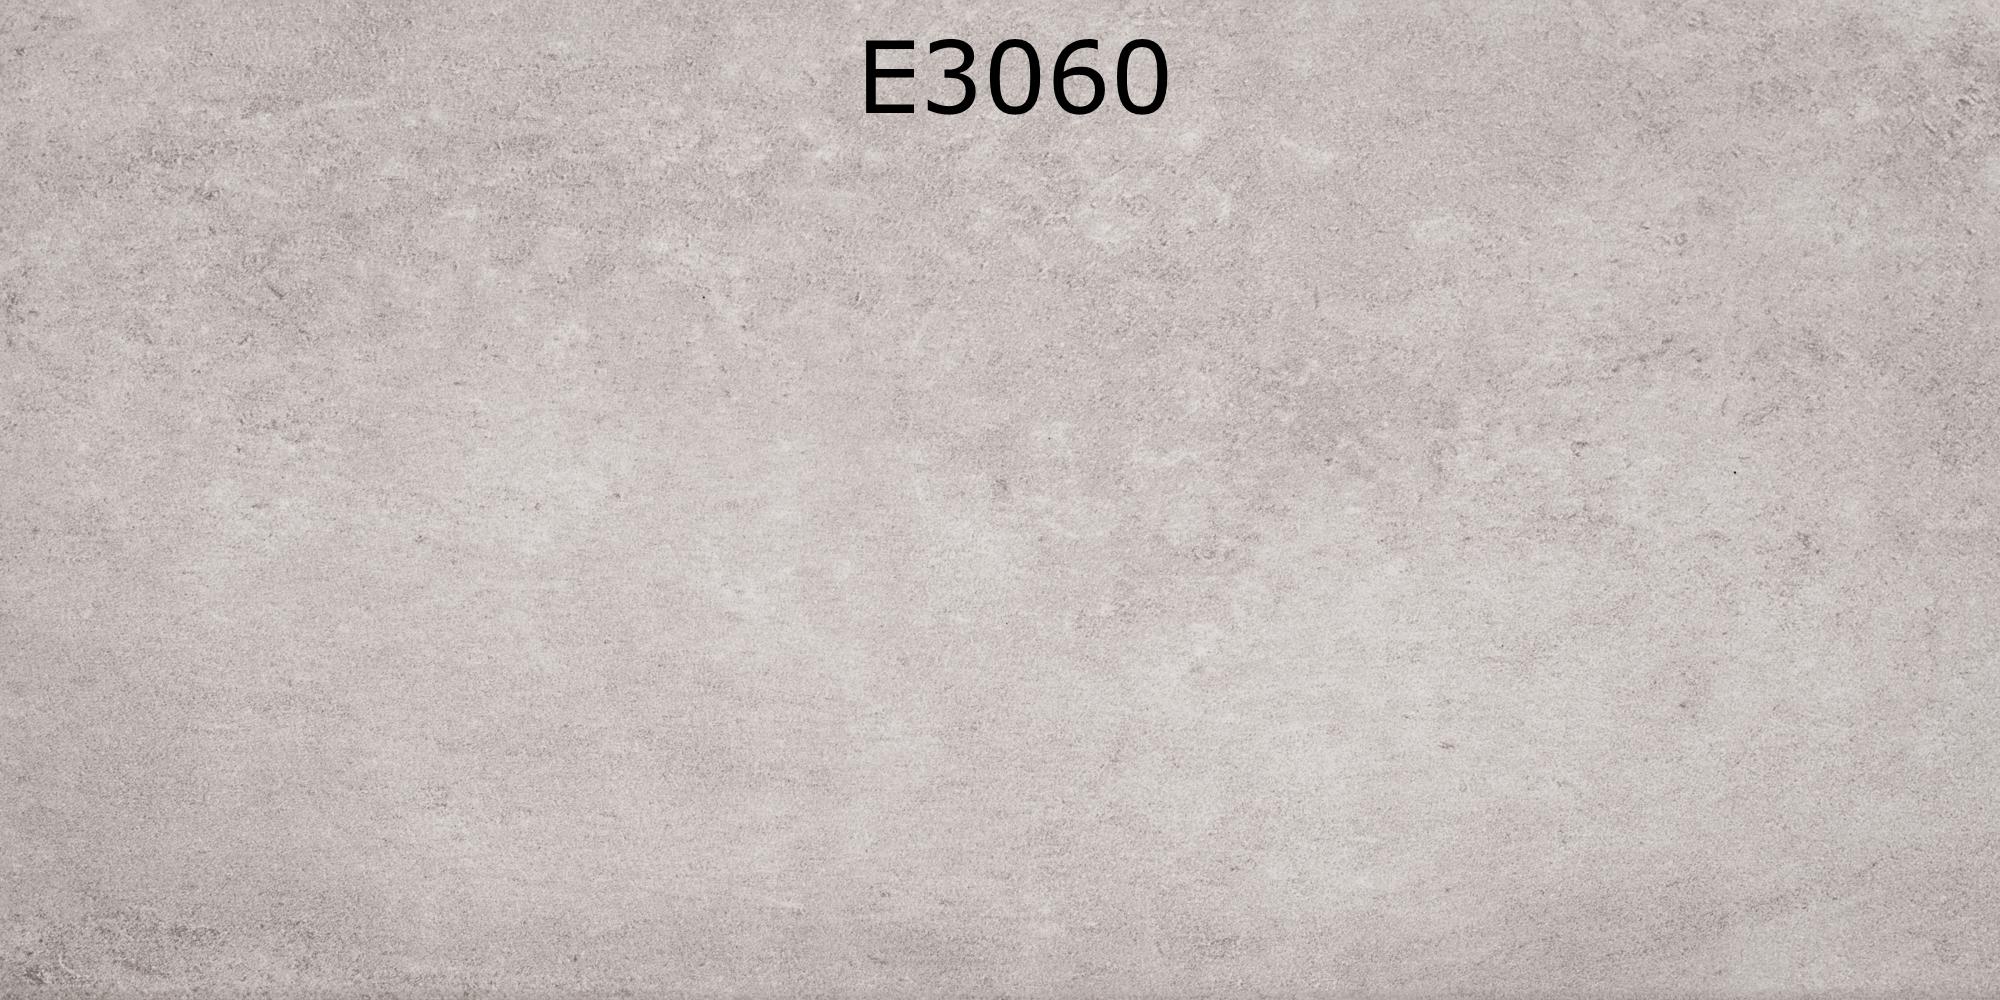 E3060